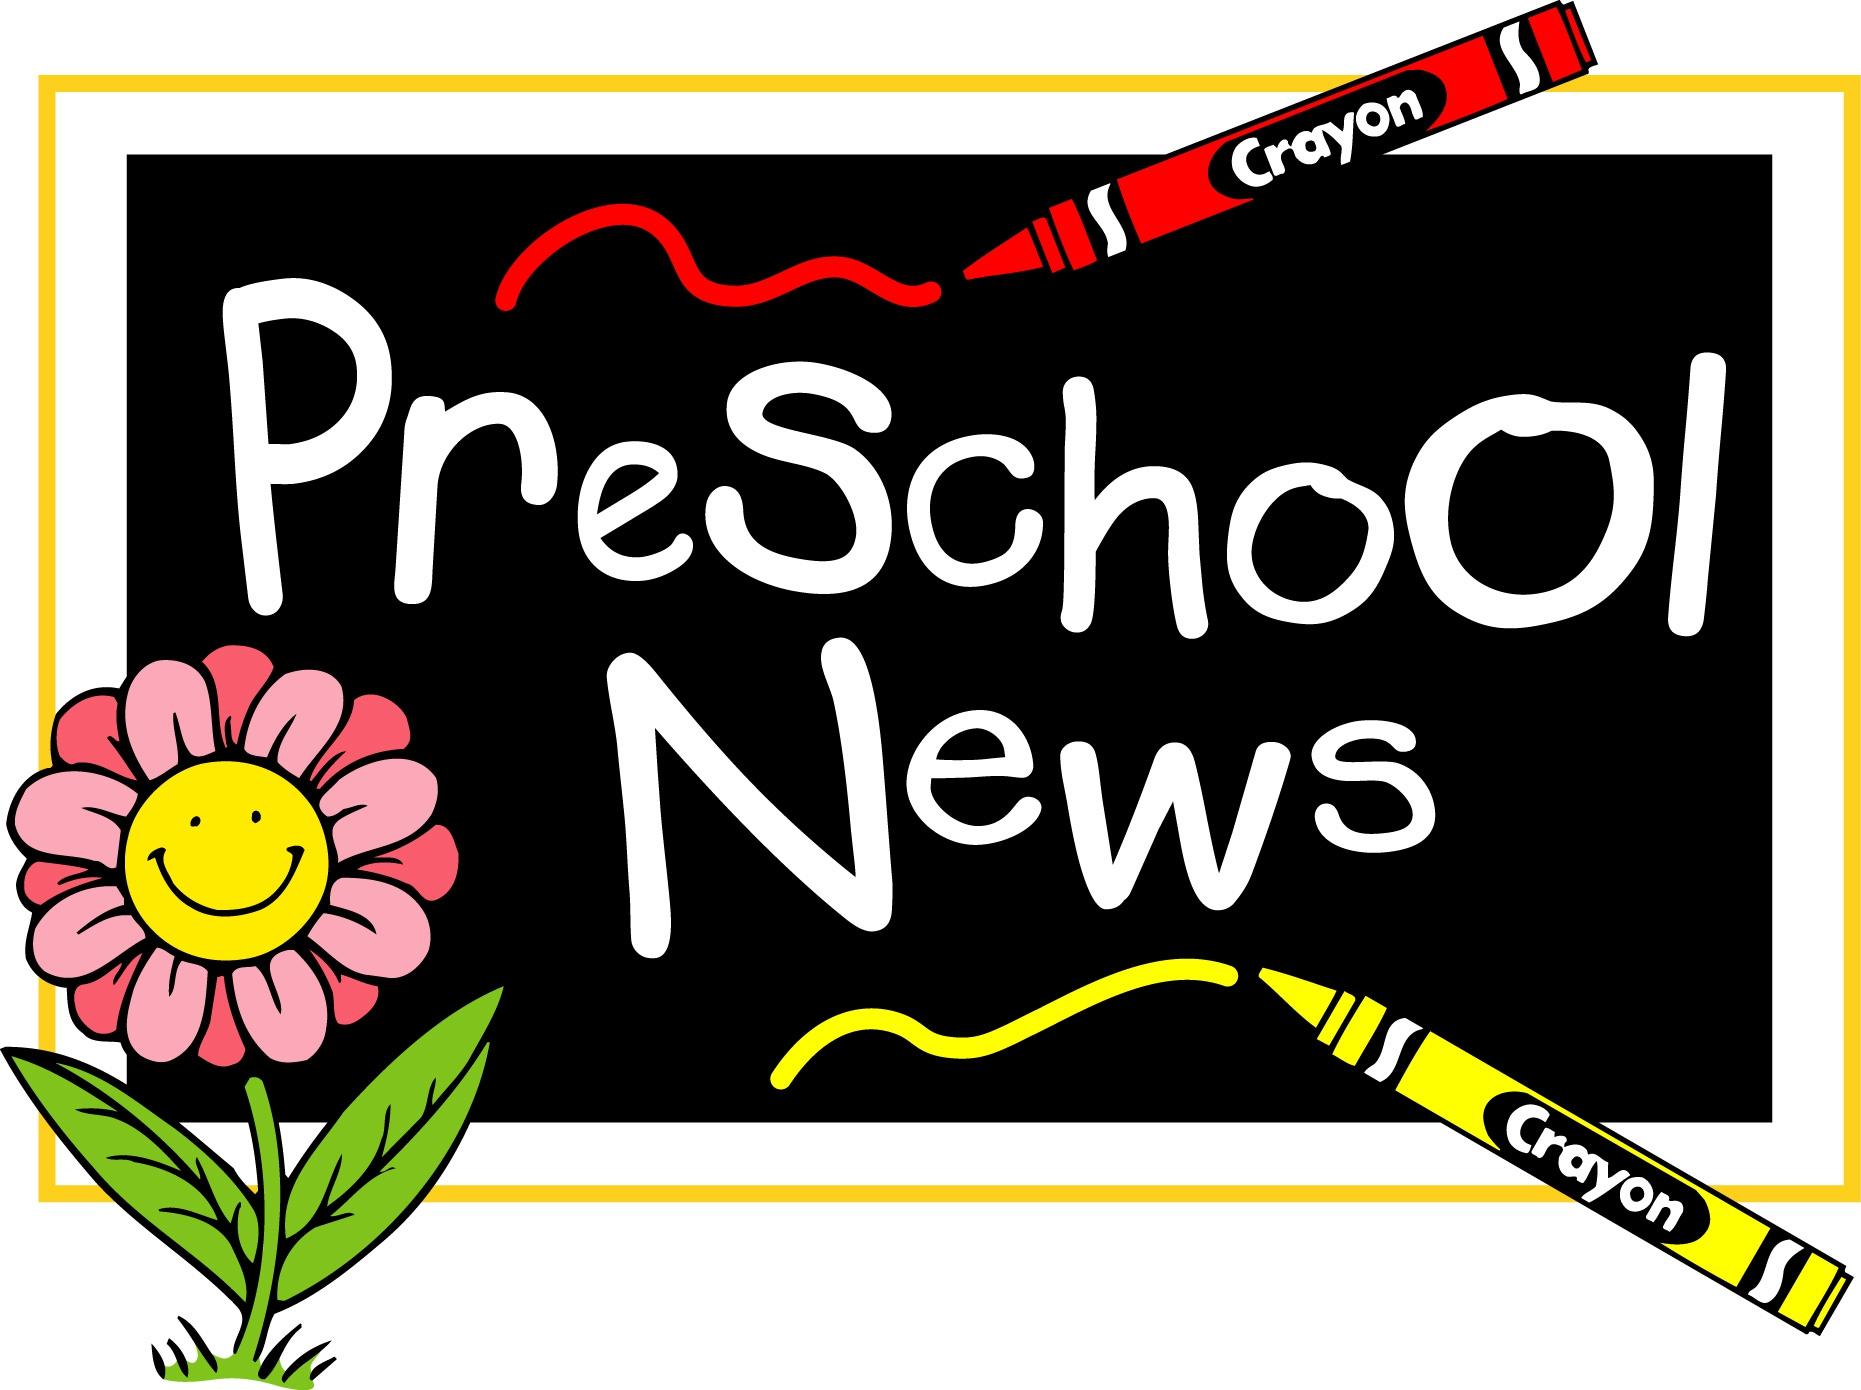 School News Clipart#1998206.